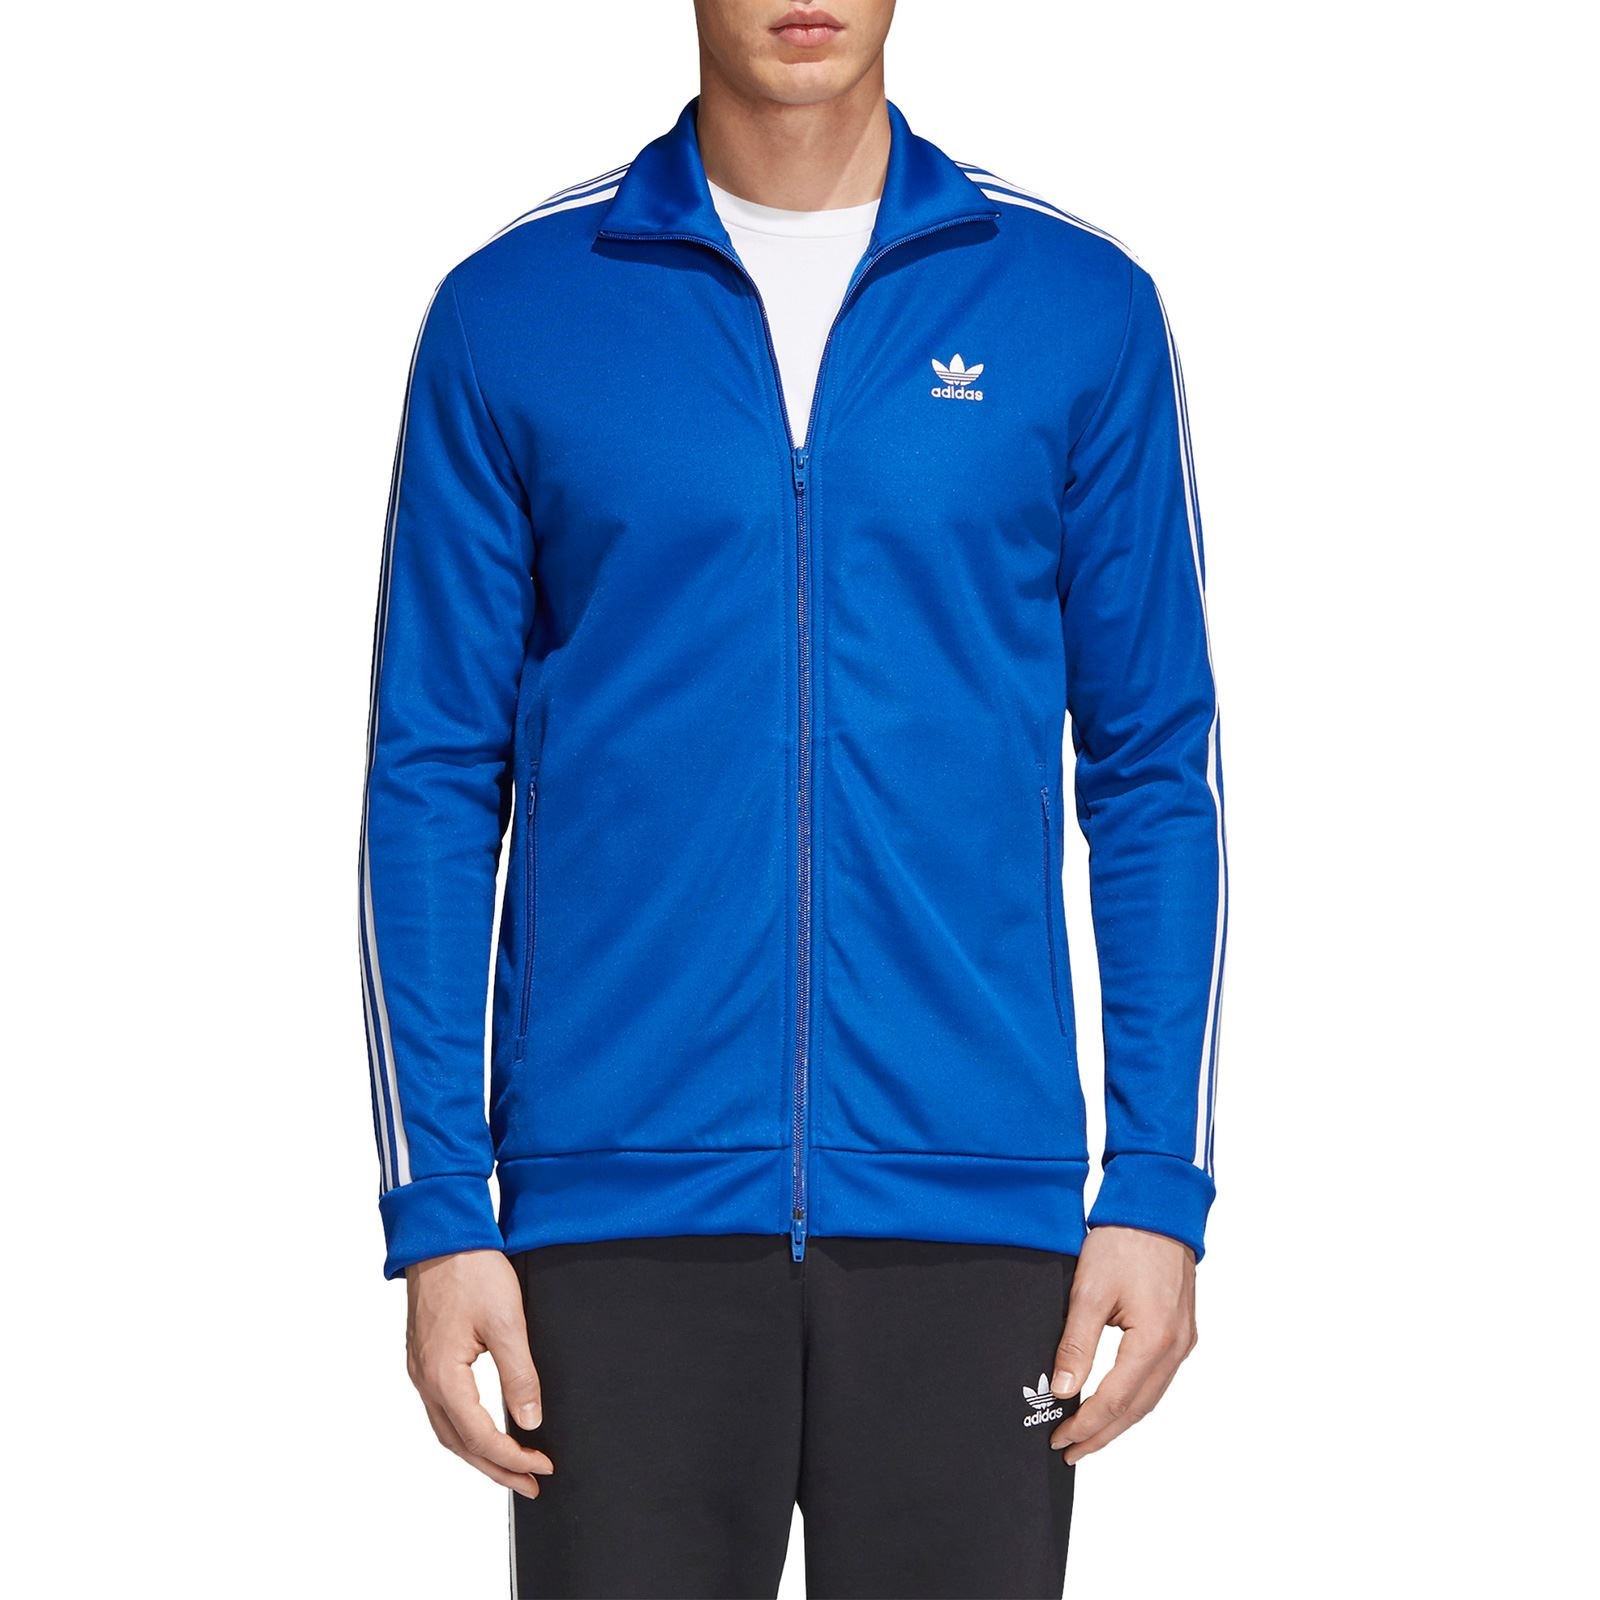 Adidas Originals Beckenbauer Veste de survêtement bleu